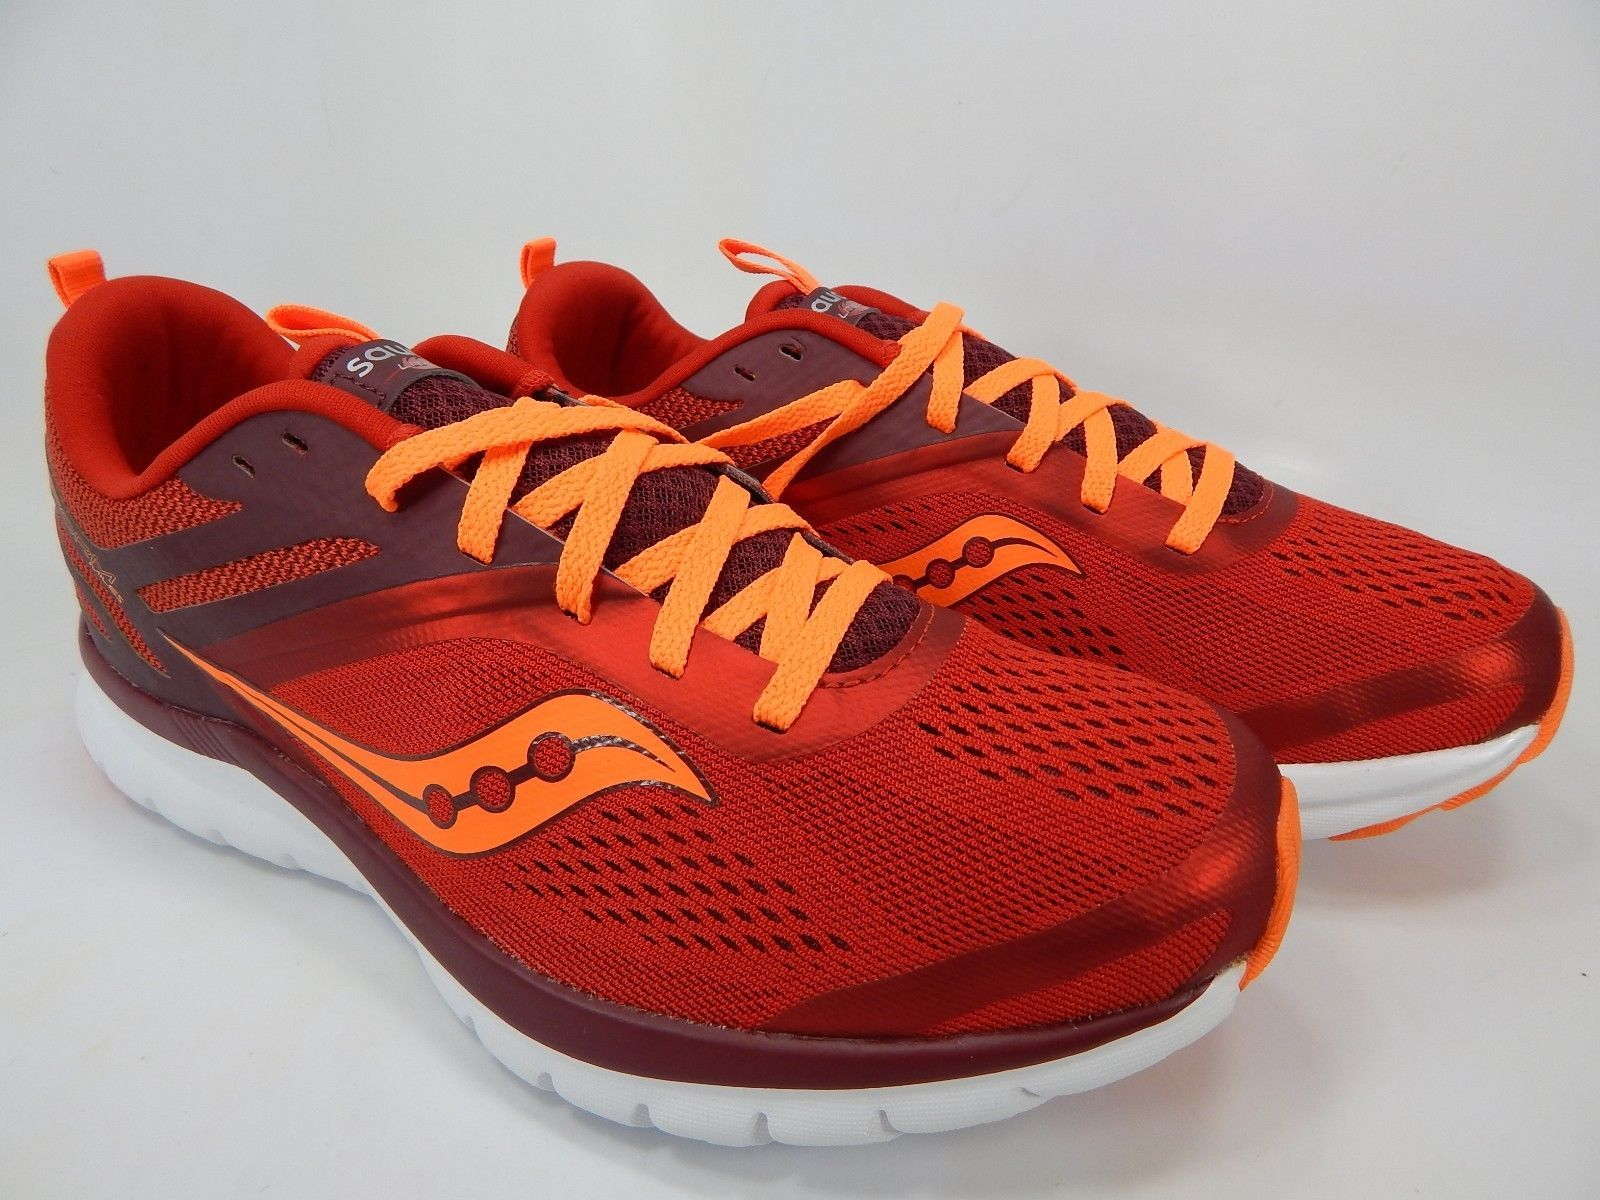 Saucony Liteform Miles Size 9 M (D) EU 42.5 Men's Running Shoes Red S40007-3